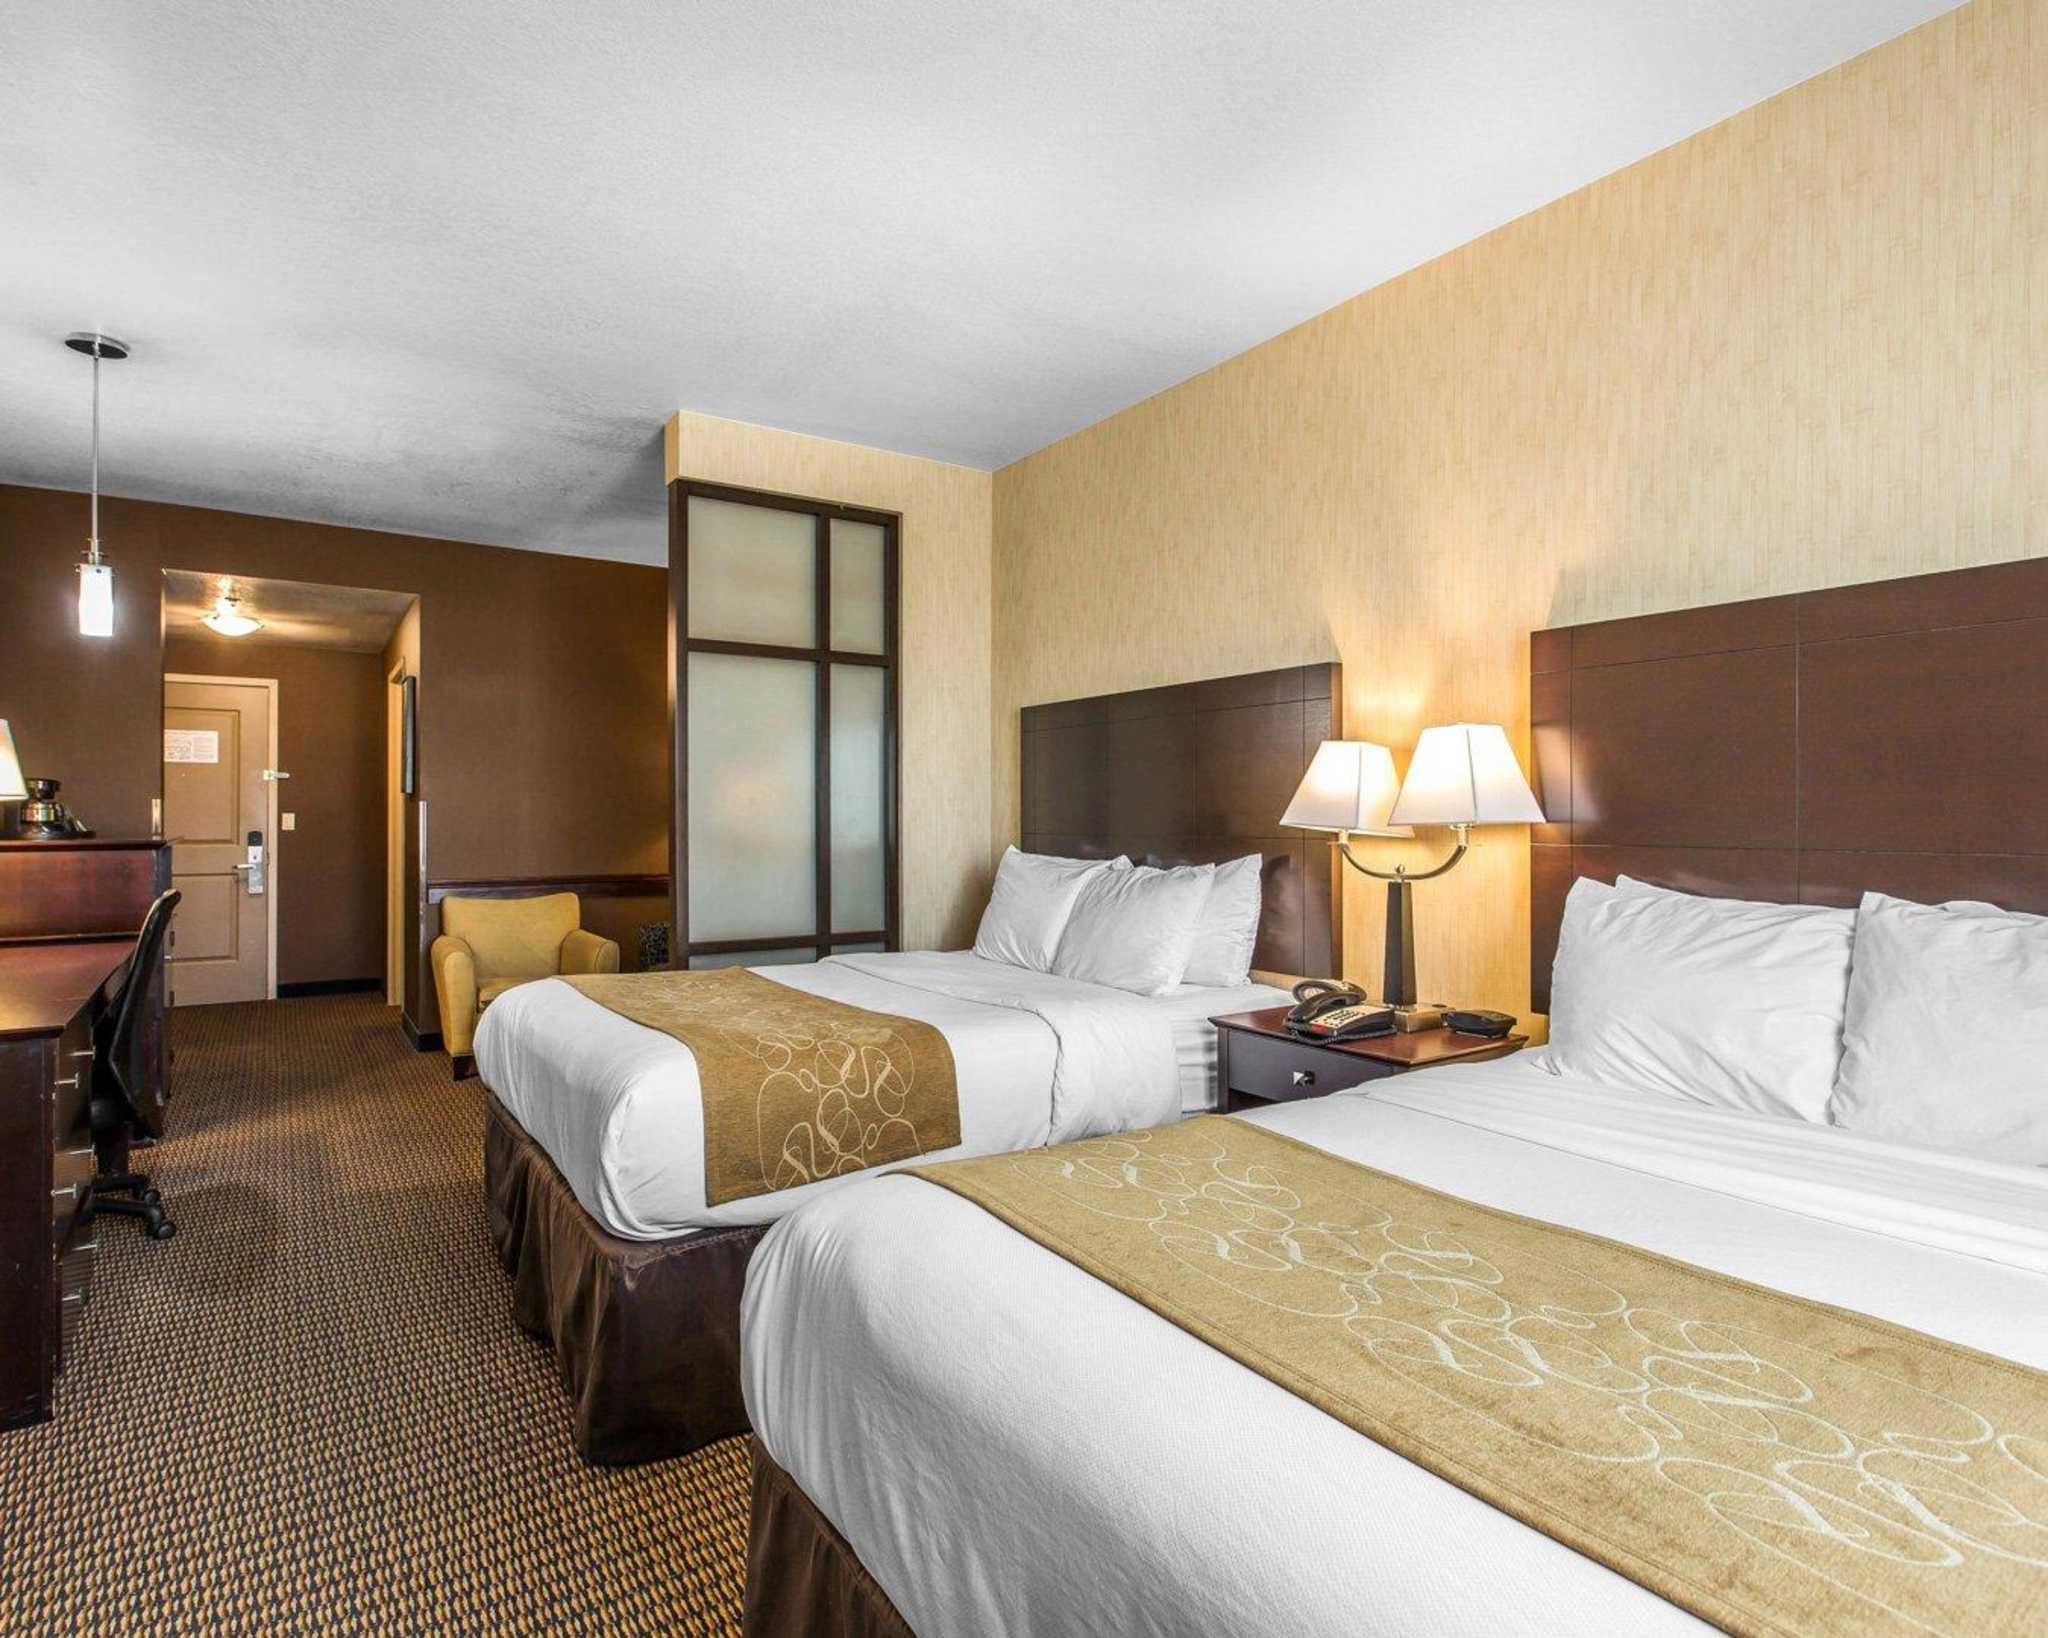 Rooms For Rent Near La Puente Ca